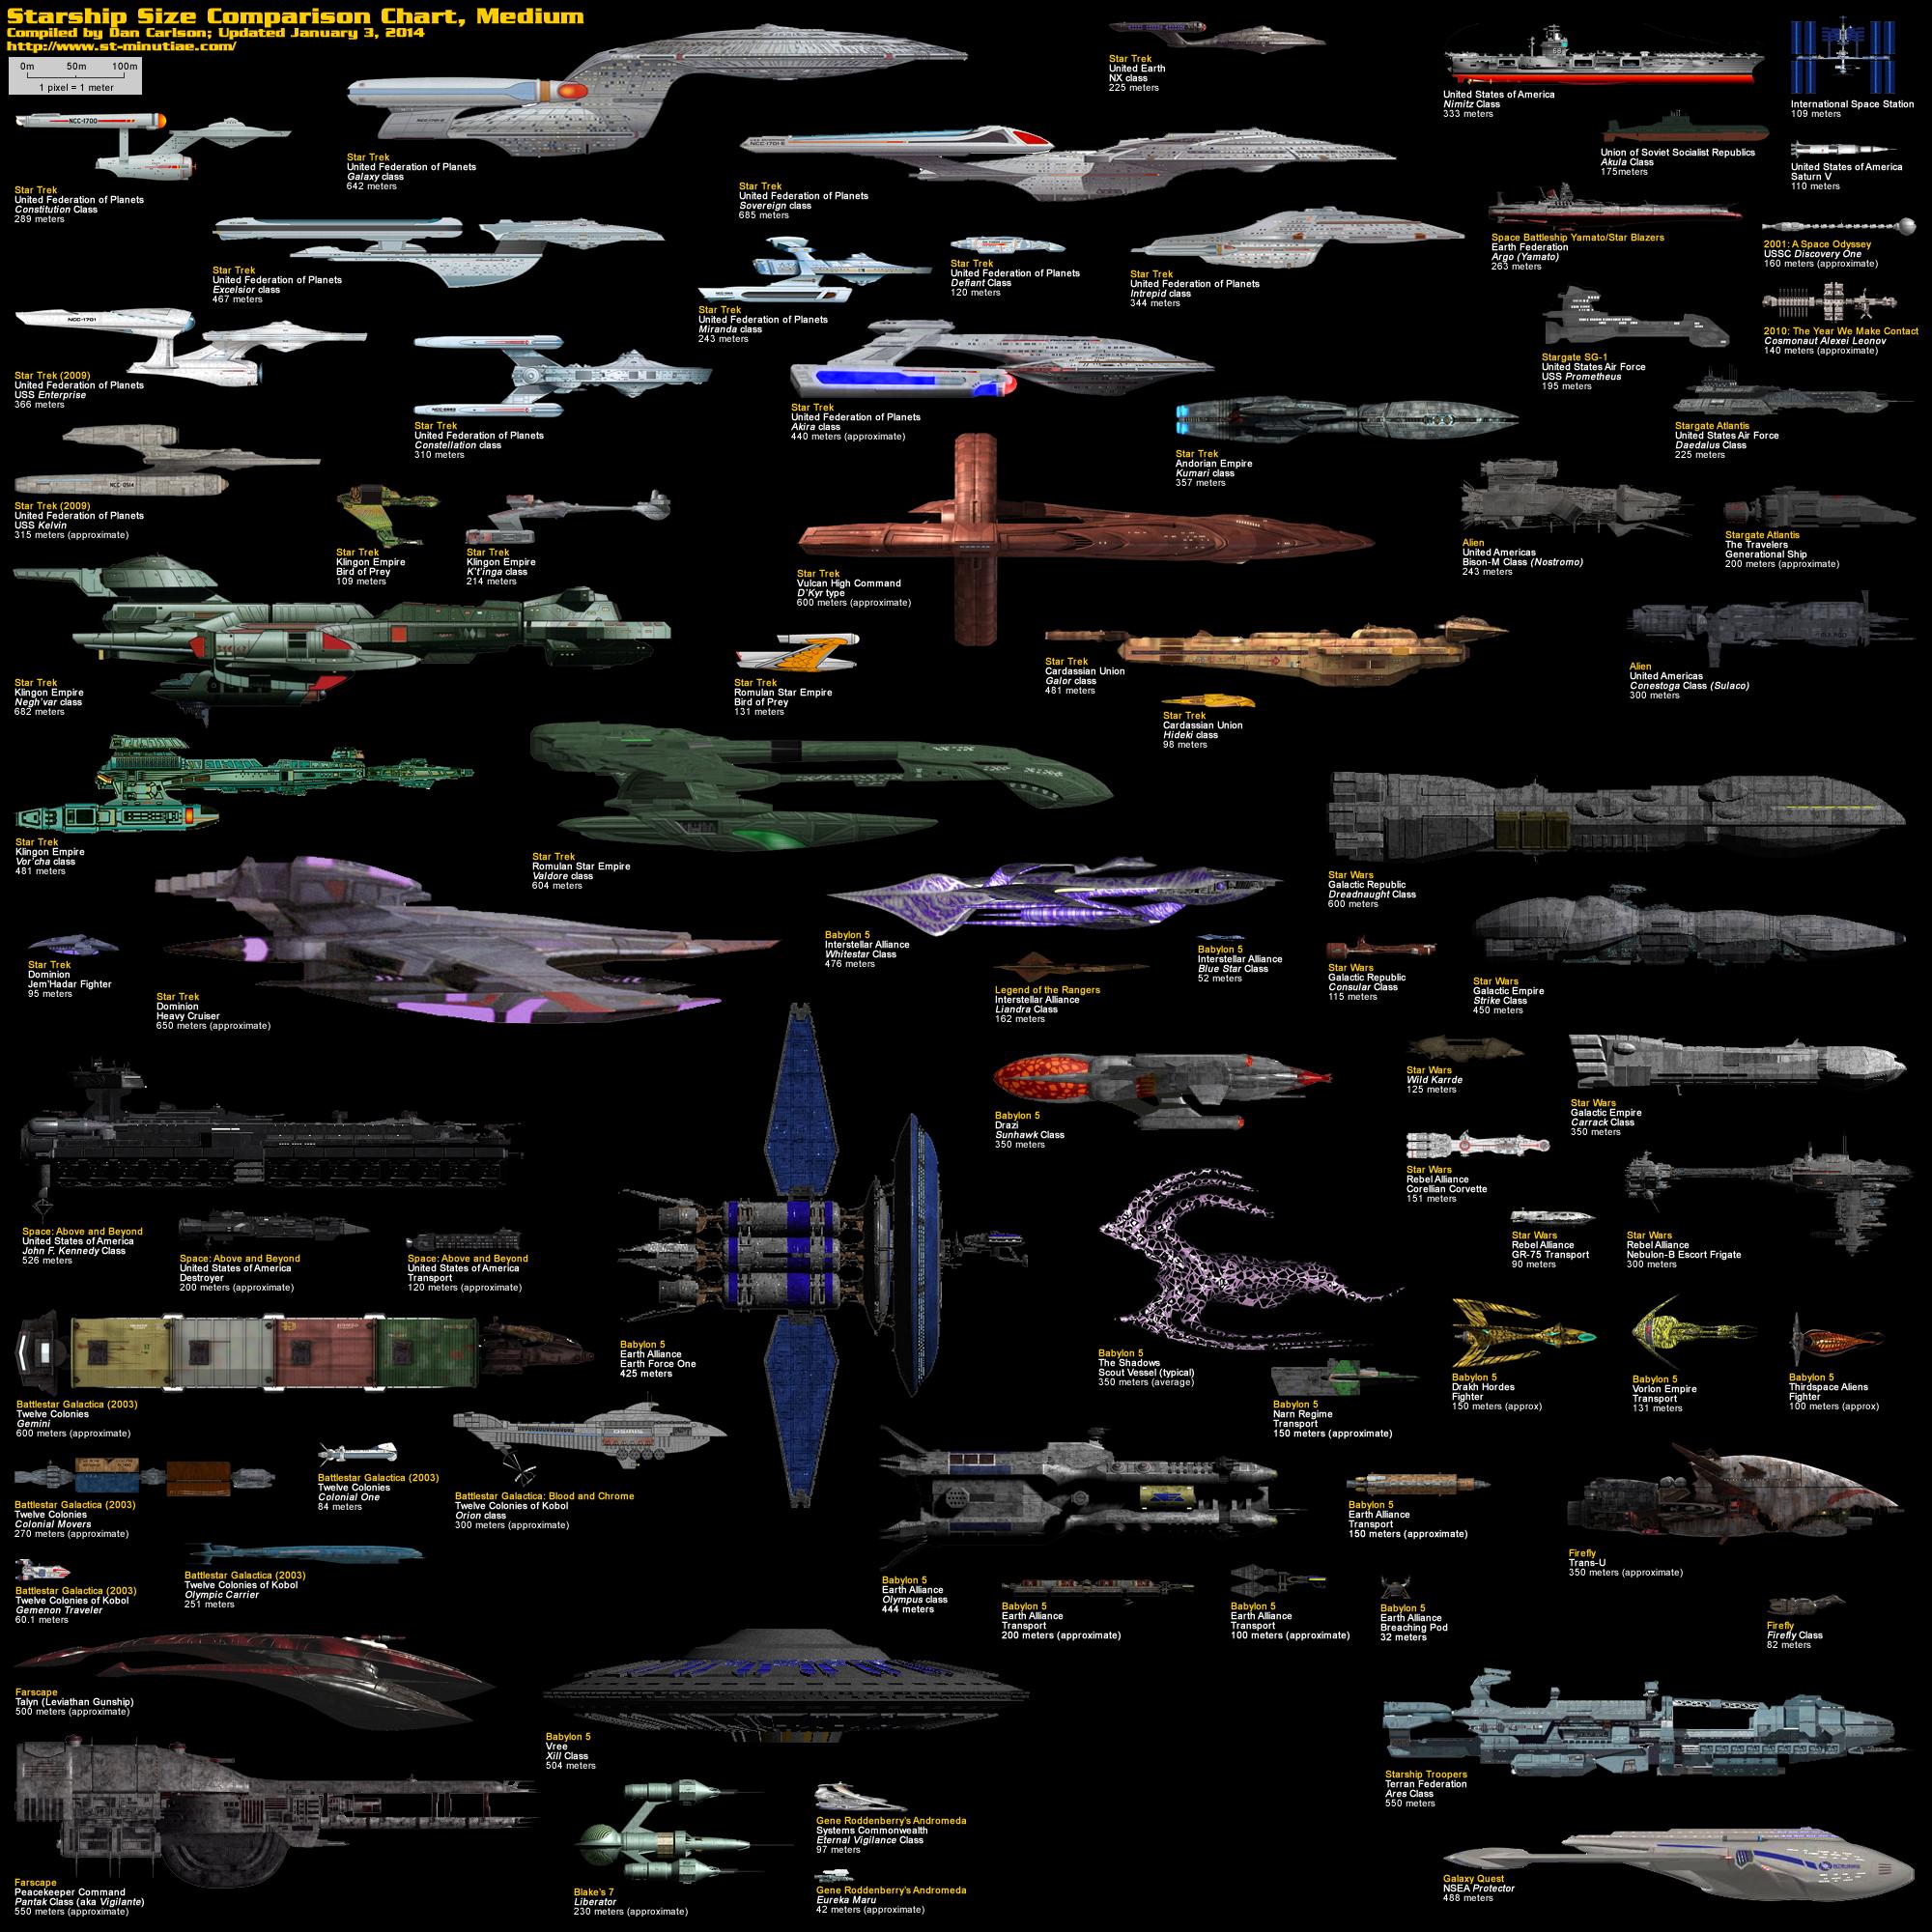 starship size comparisons: medium - Imgur | Scifi ship, Star trek  starships, Star trek